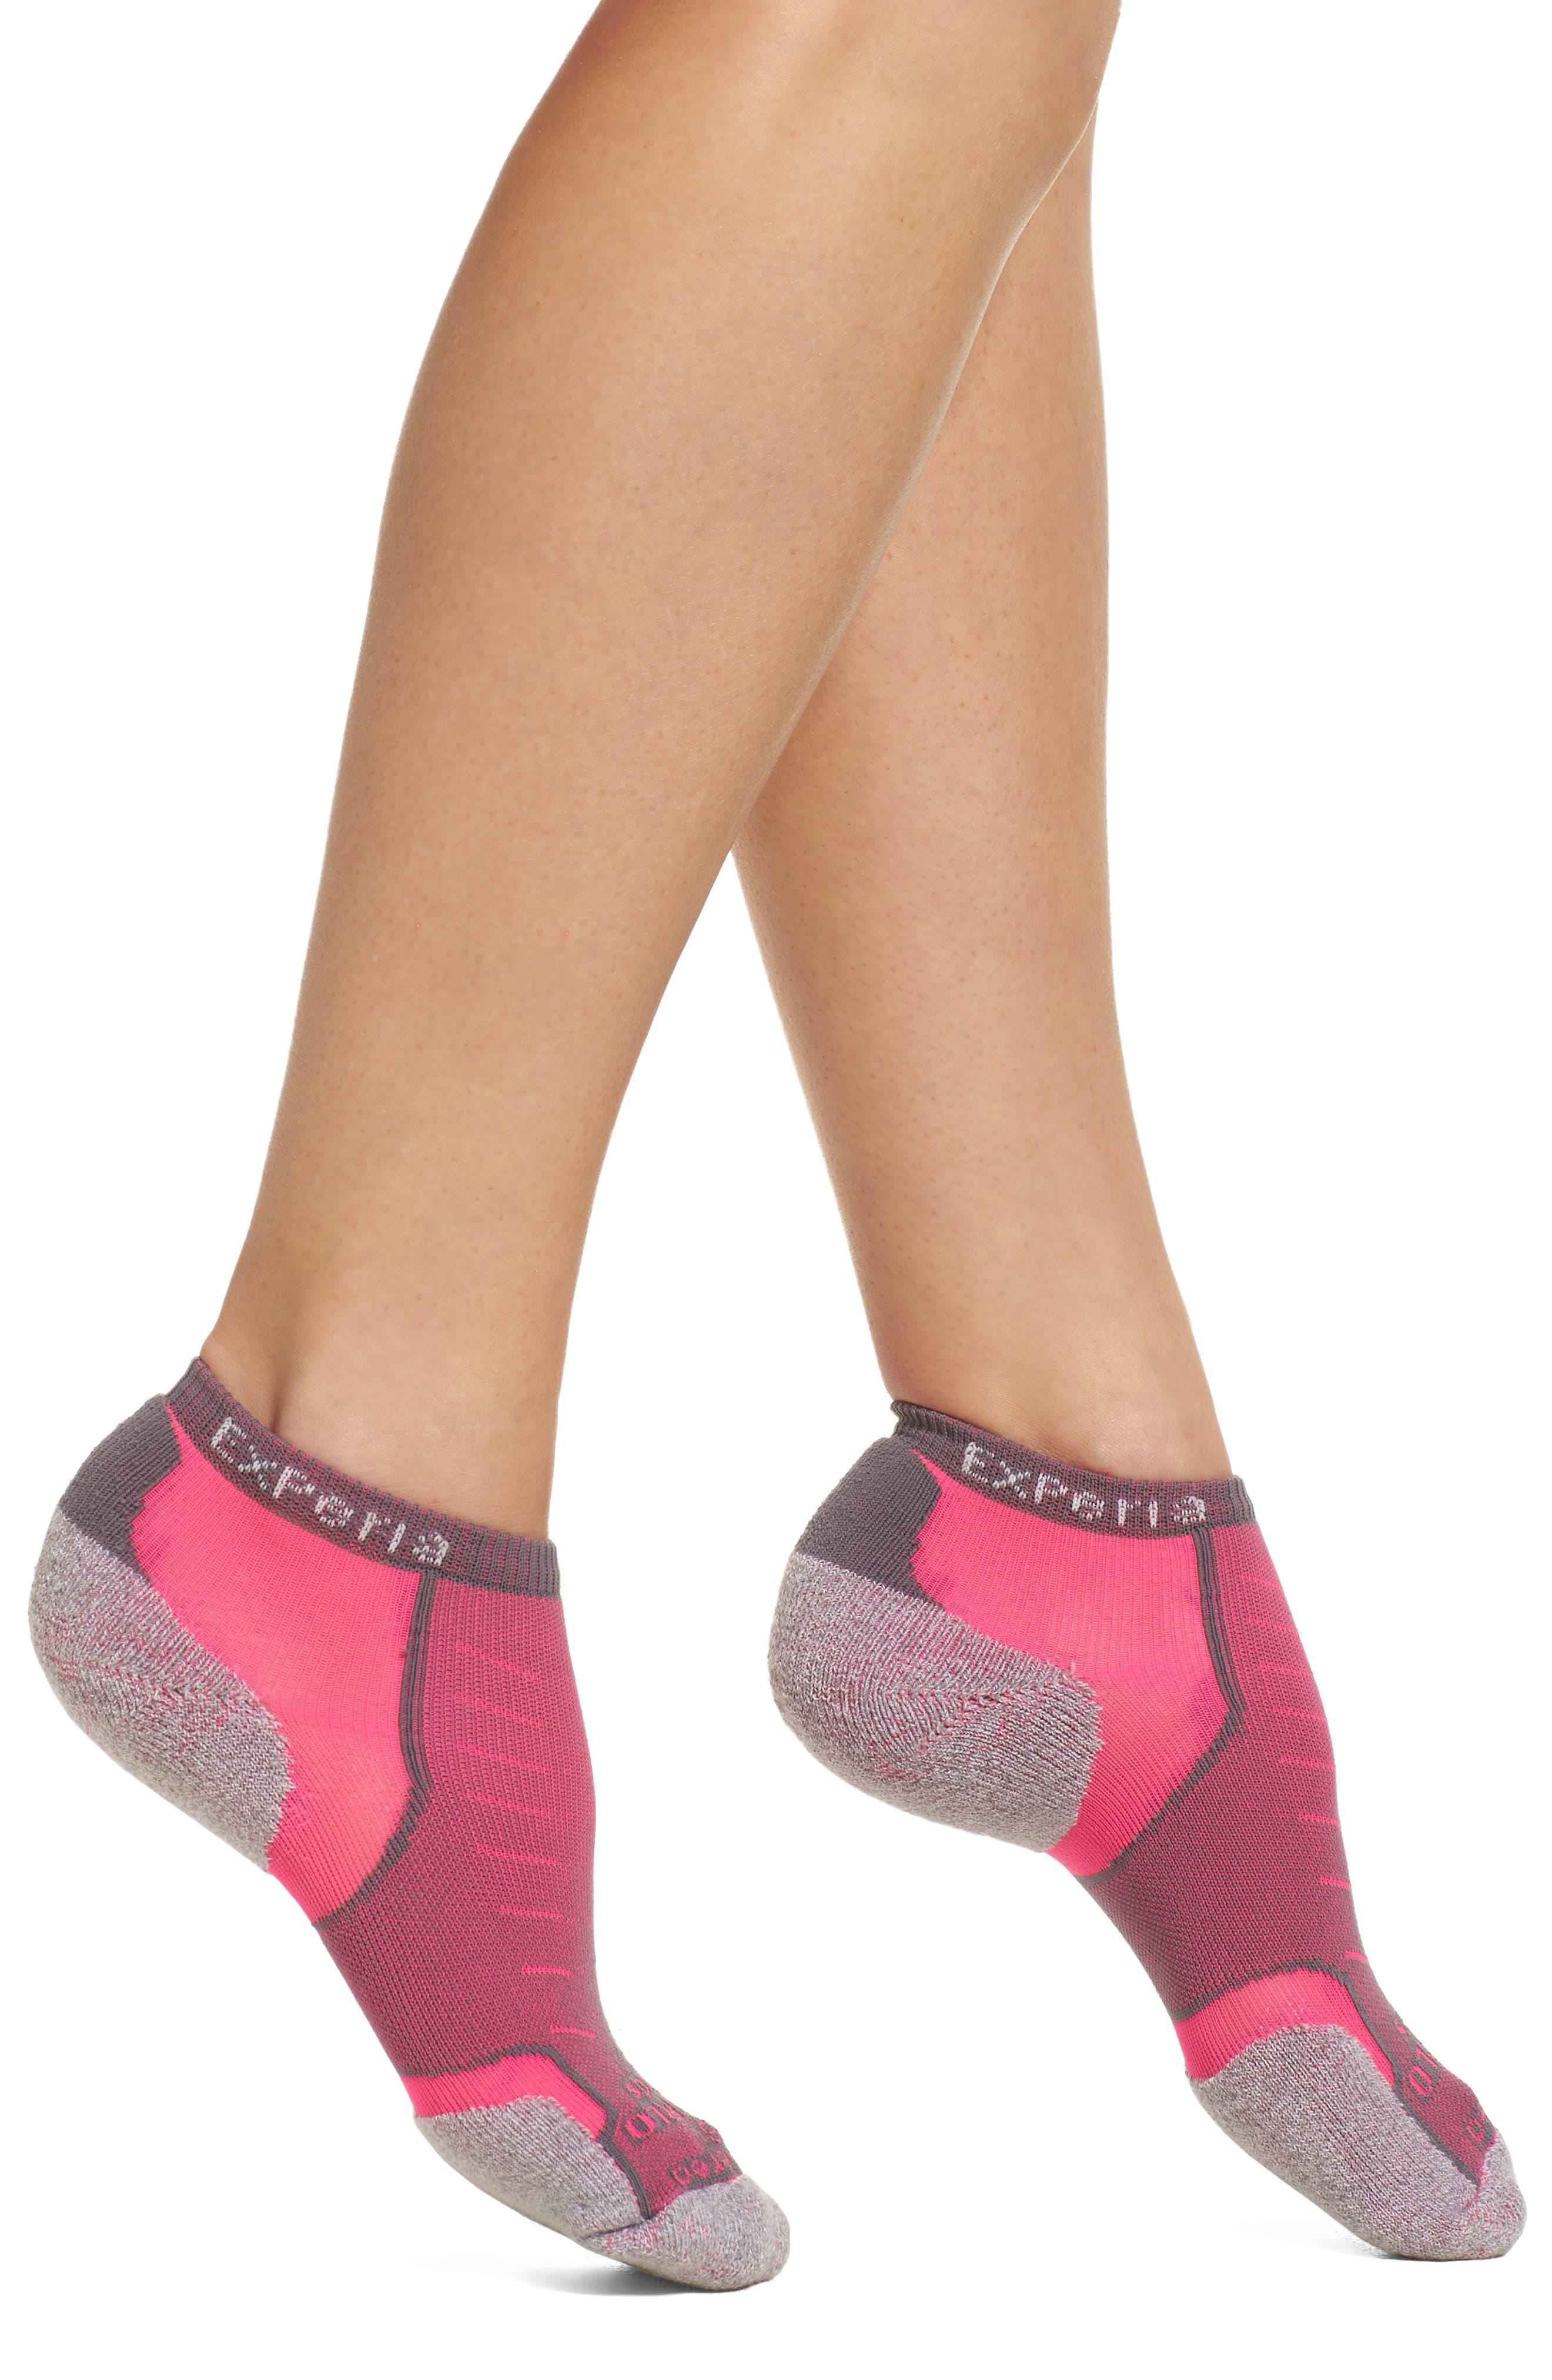 Thorlo Experia® No-Show Performance Socks